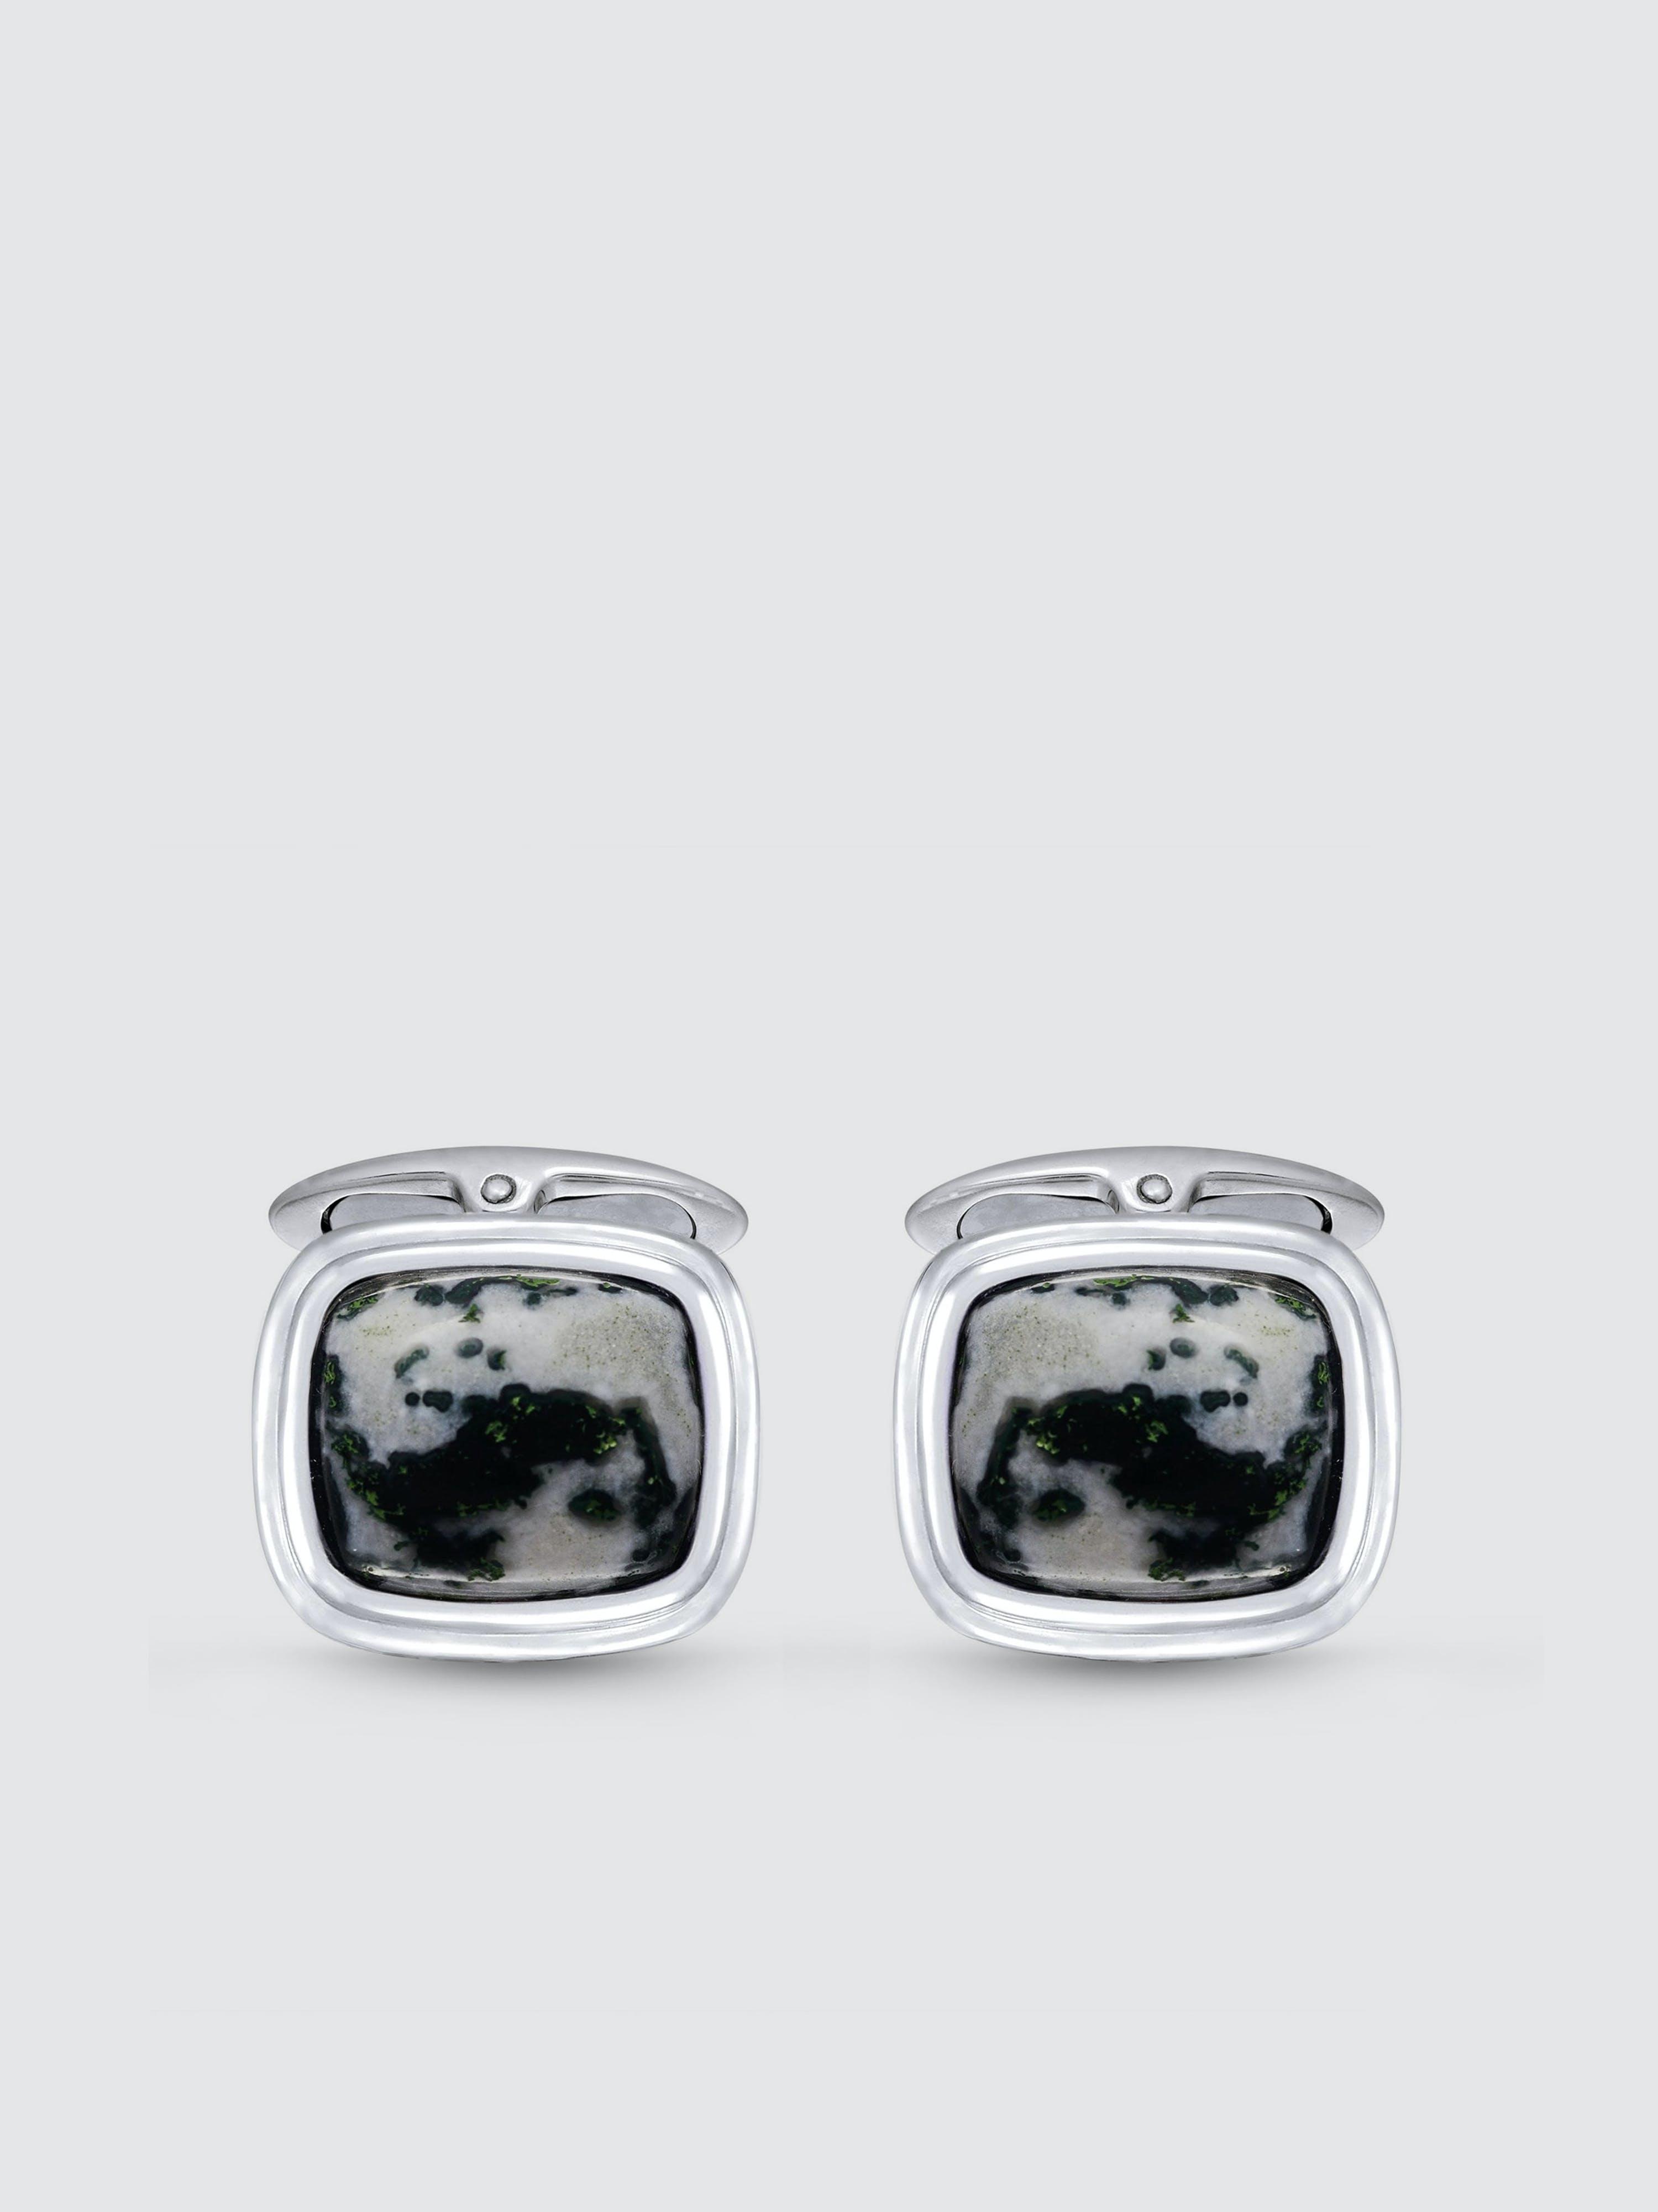 Luvmyjewelry Tree Agate Stone Cufflinks In Black Rhodium Plated Sterling Silver In Grey